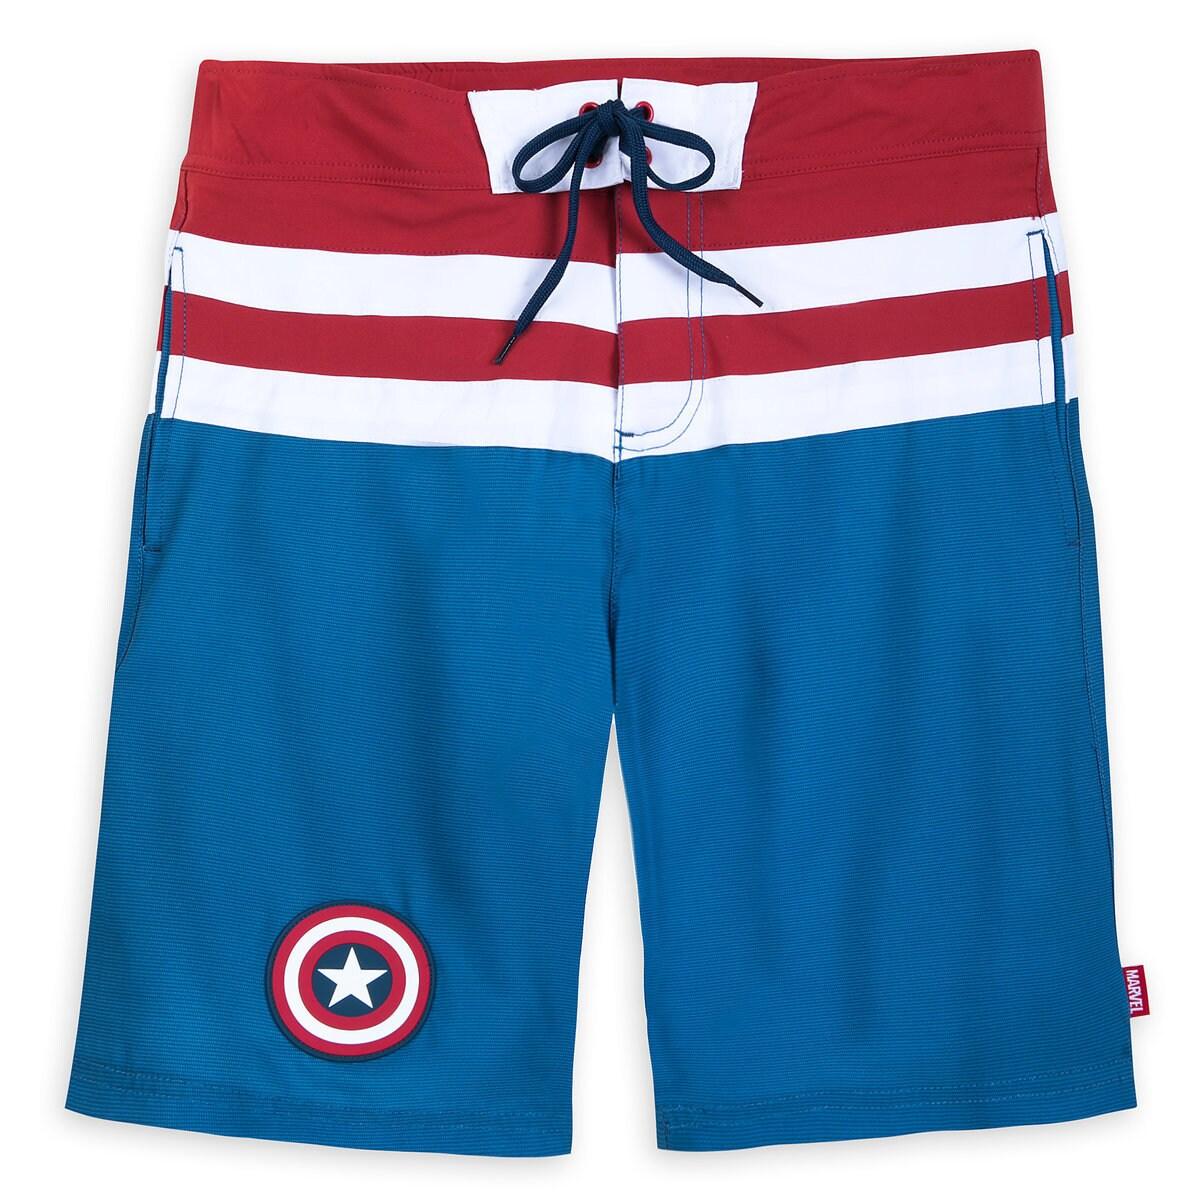 d62f91b86a Product Image of Captain America Swim Trunks for Men # 1